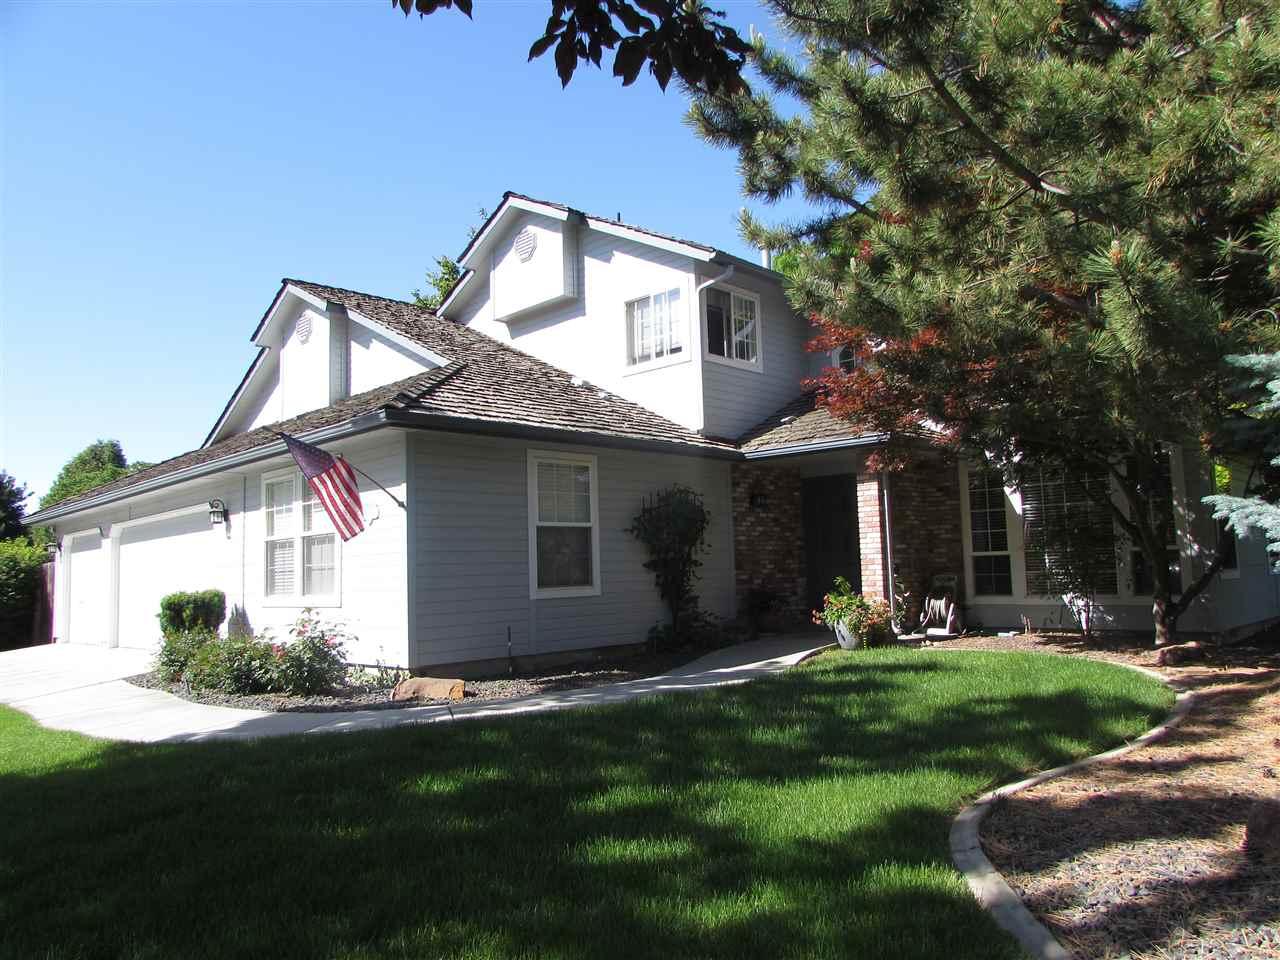 8155 Burntree Ct, Boise, ID 83704